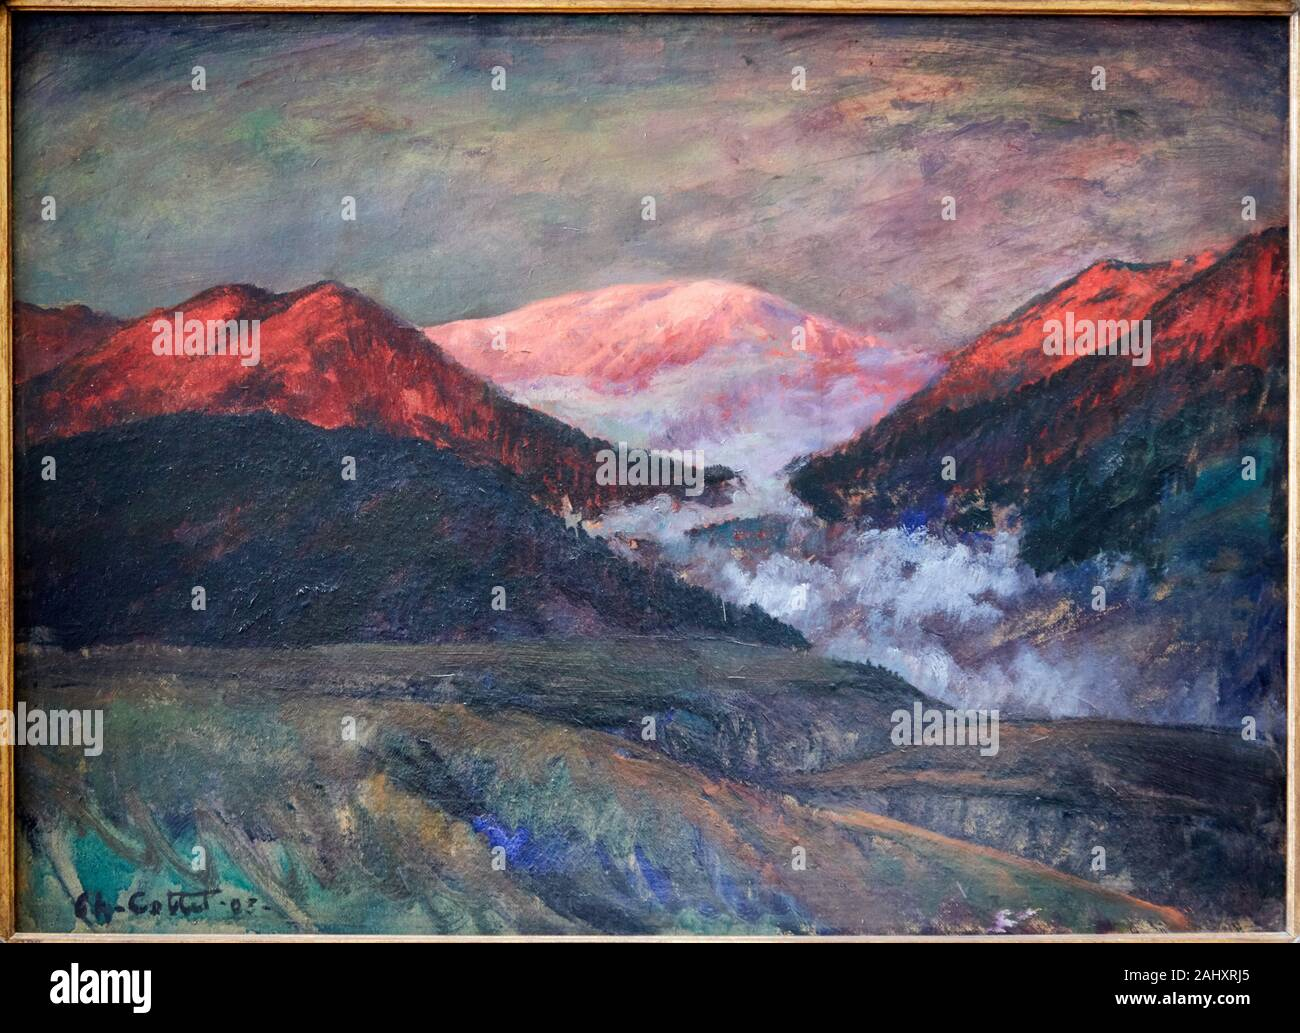 '''Nebbia in montagna al crepuscolo'' 1903, Charles Cottet (1863-1925), il Musée Rodin Museum, Parigi, Francia Foto Stock